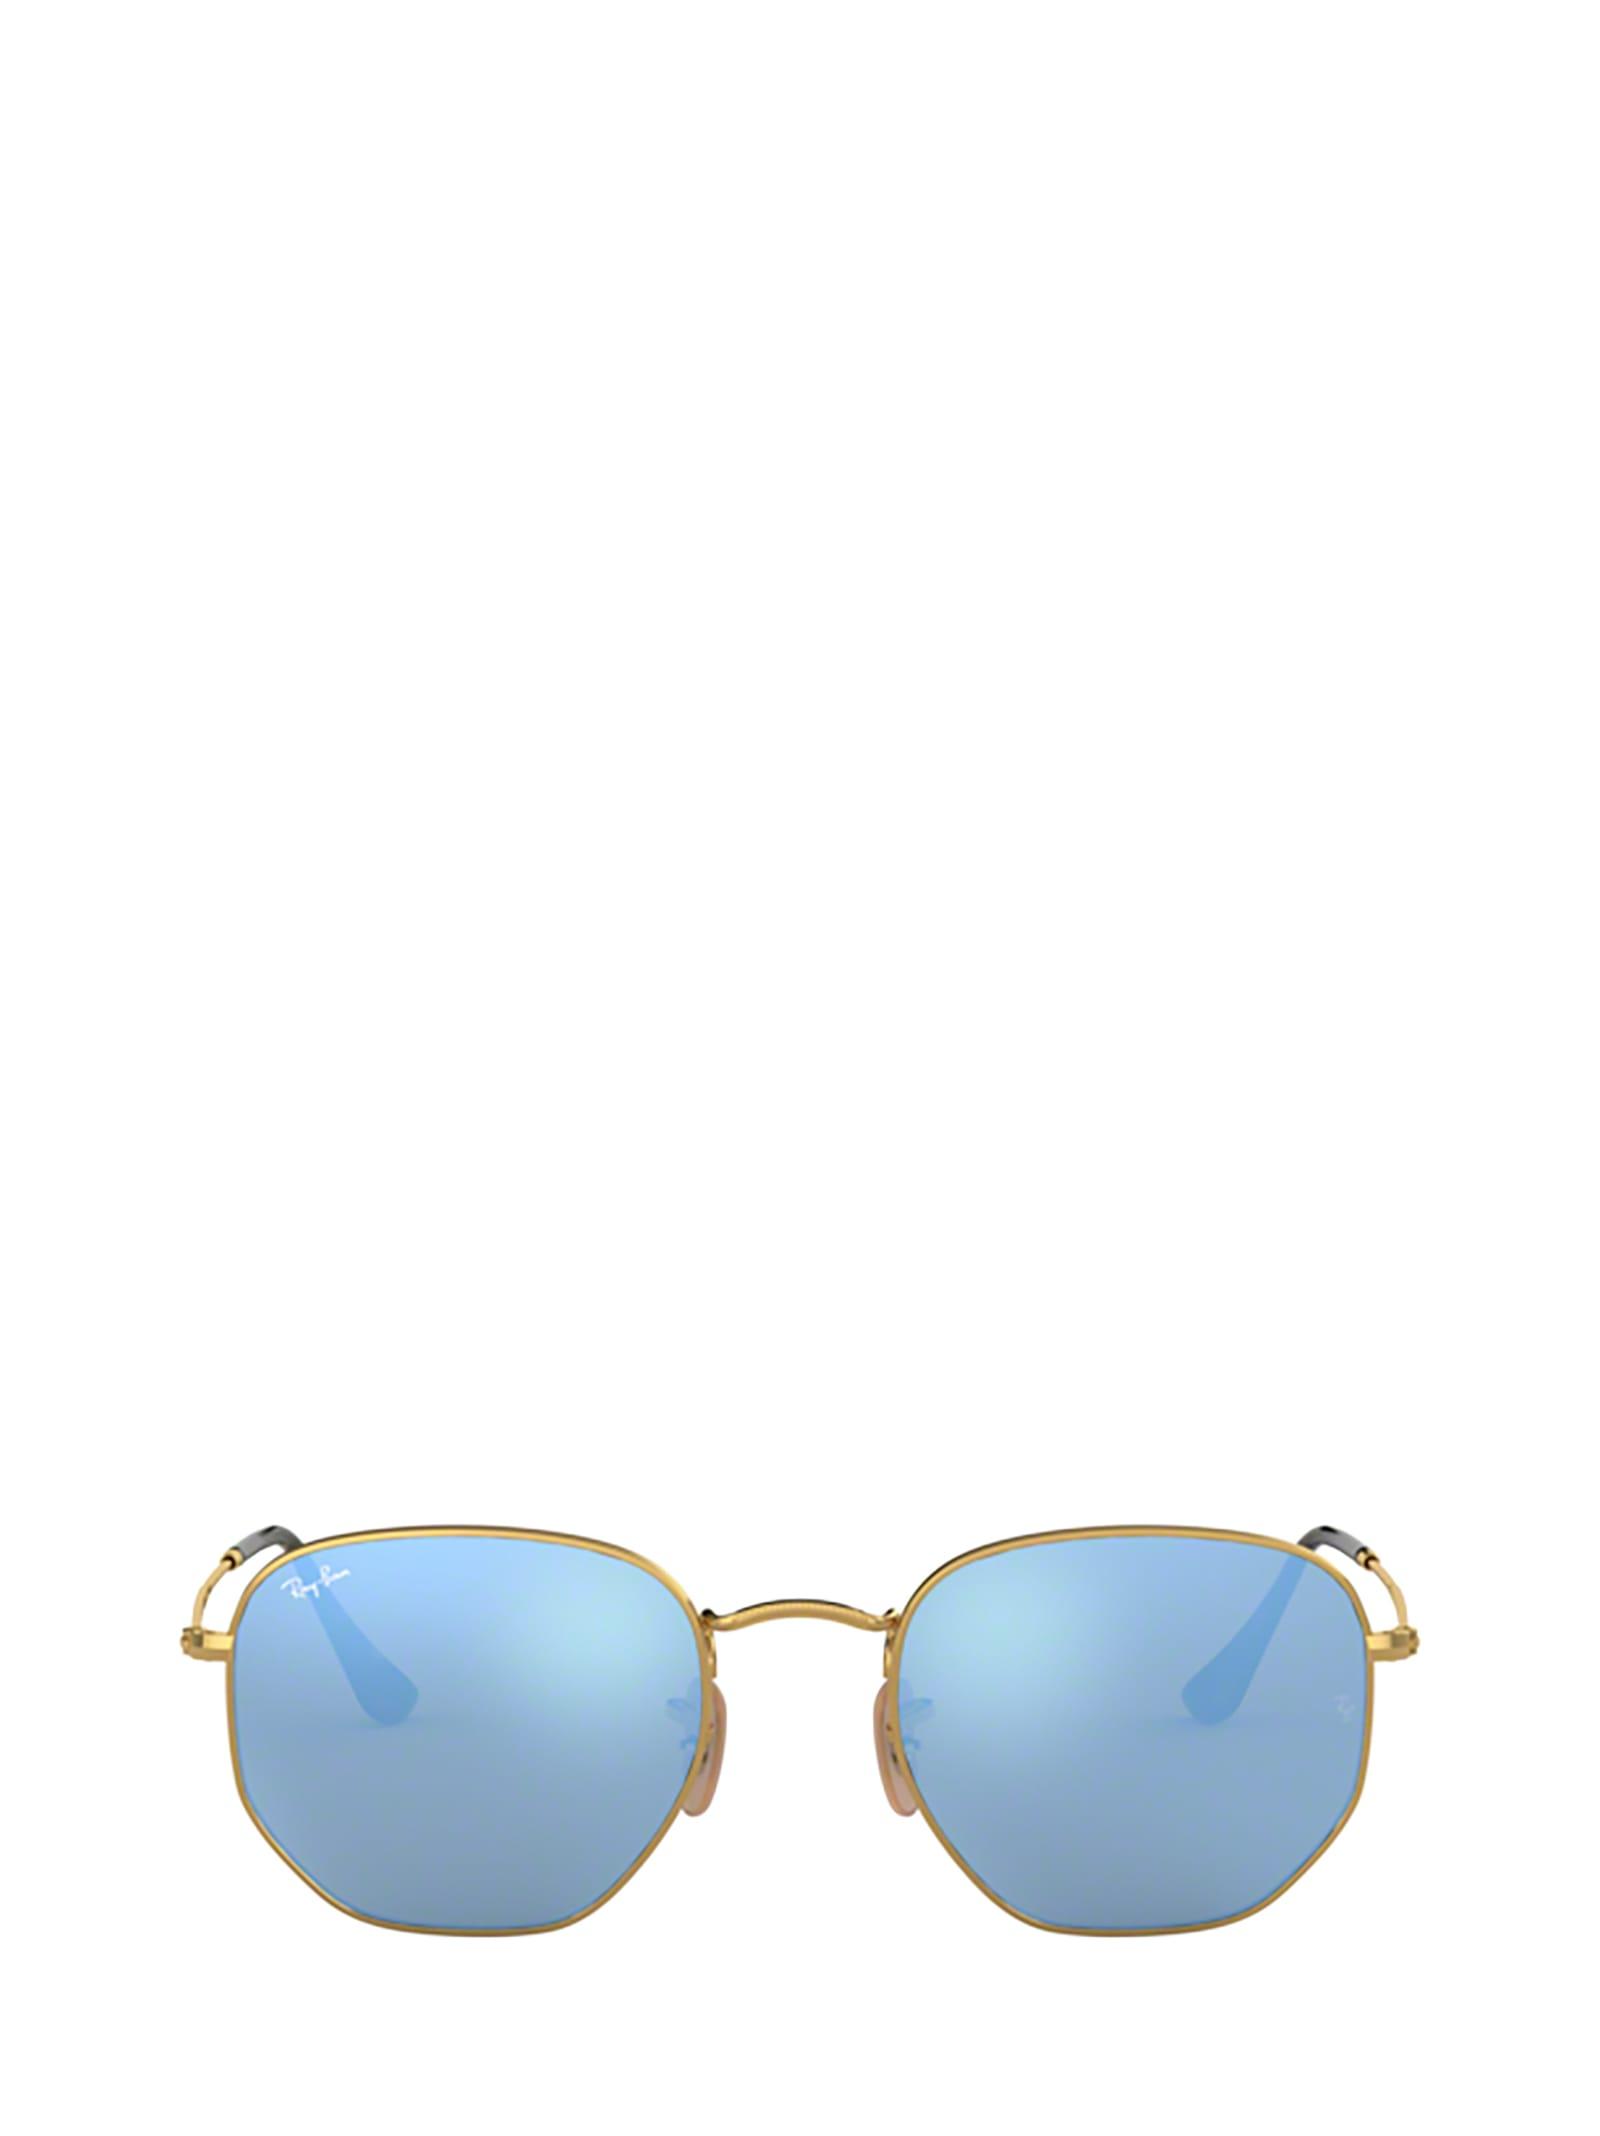 Ray-Ban Ray-ban Rb3548n Arista Sunglasses